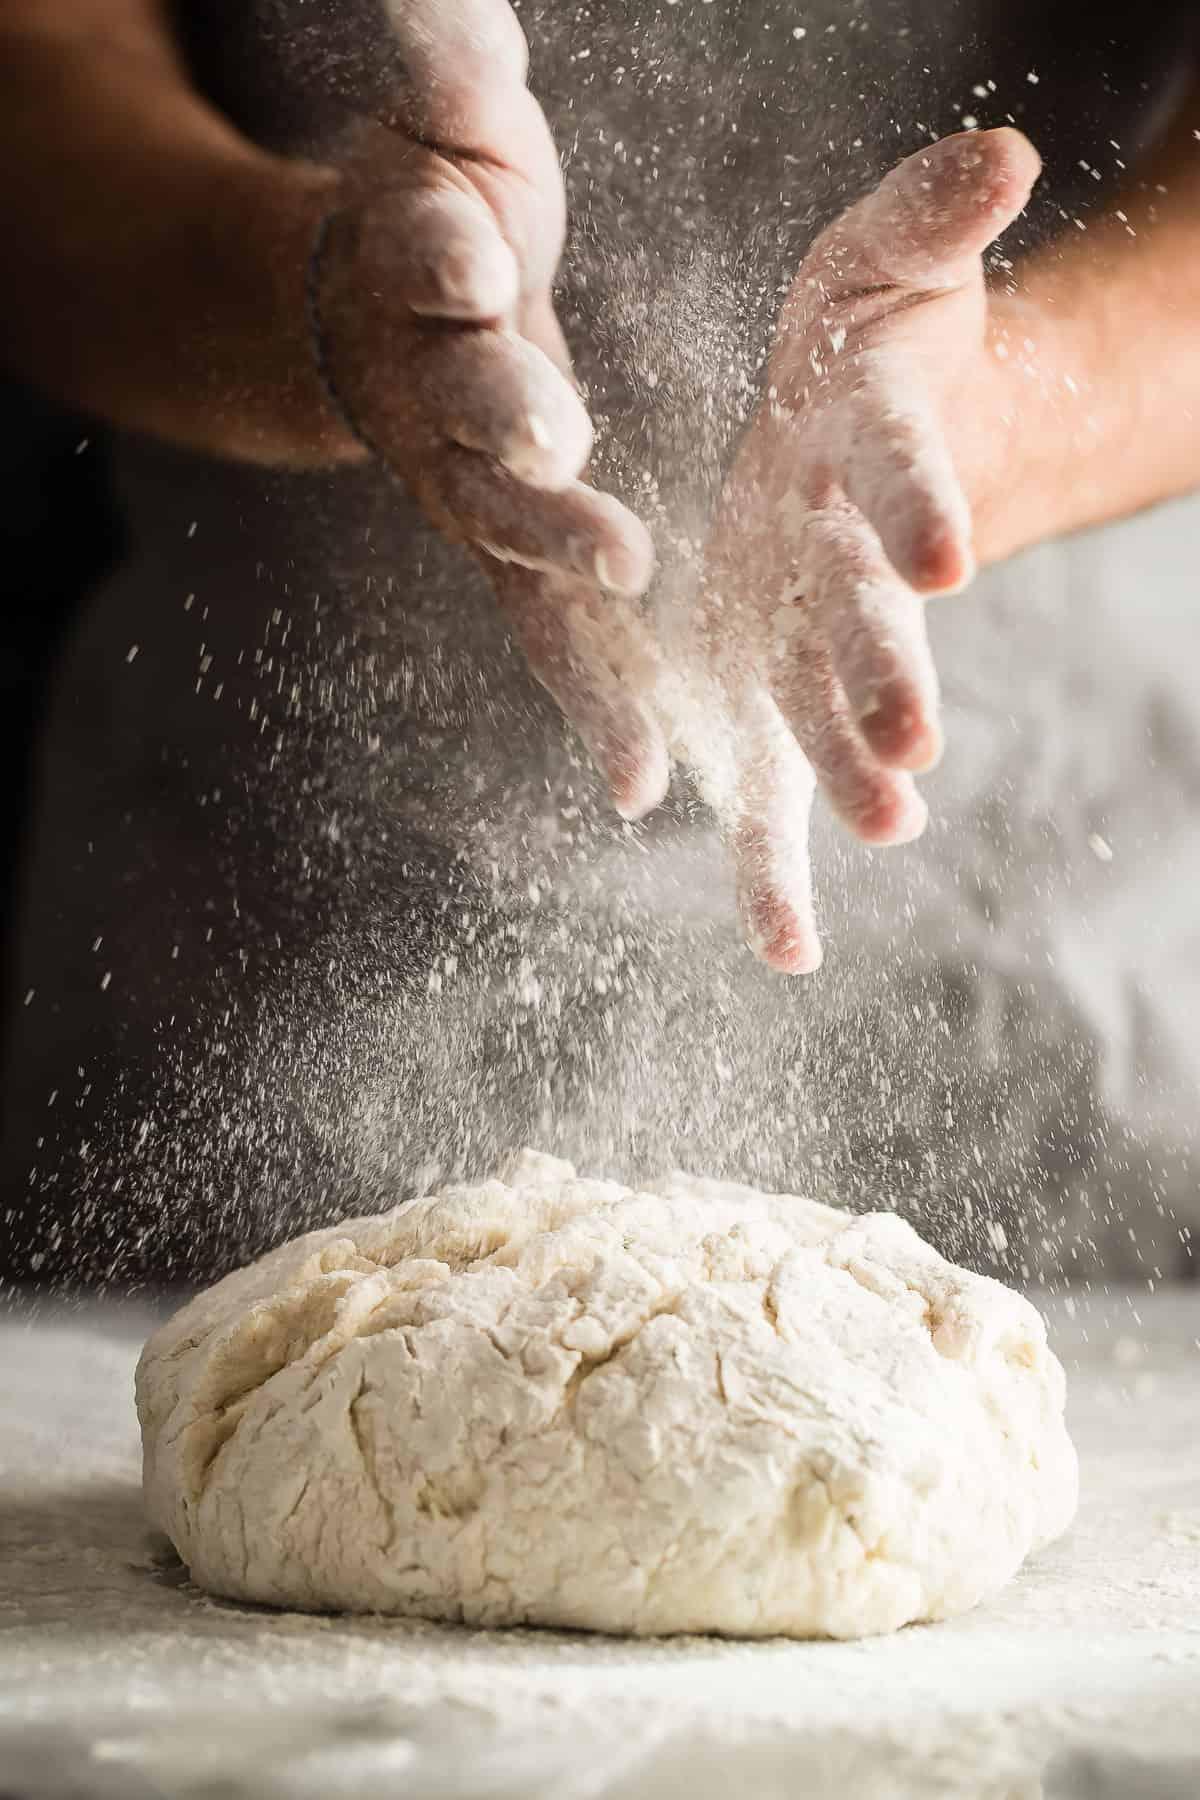 a ball of dough with flour